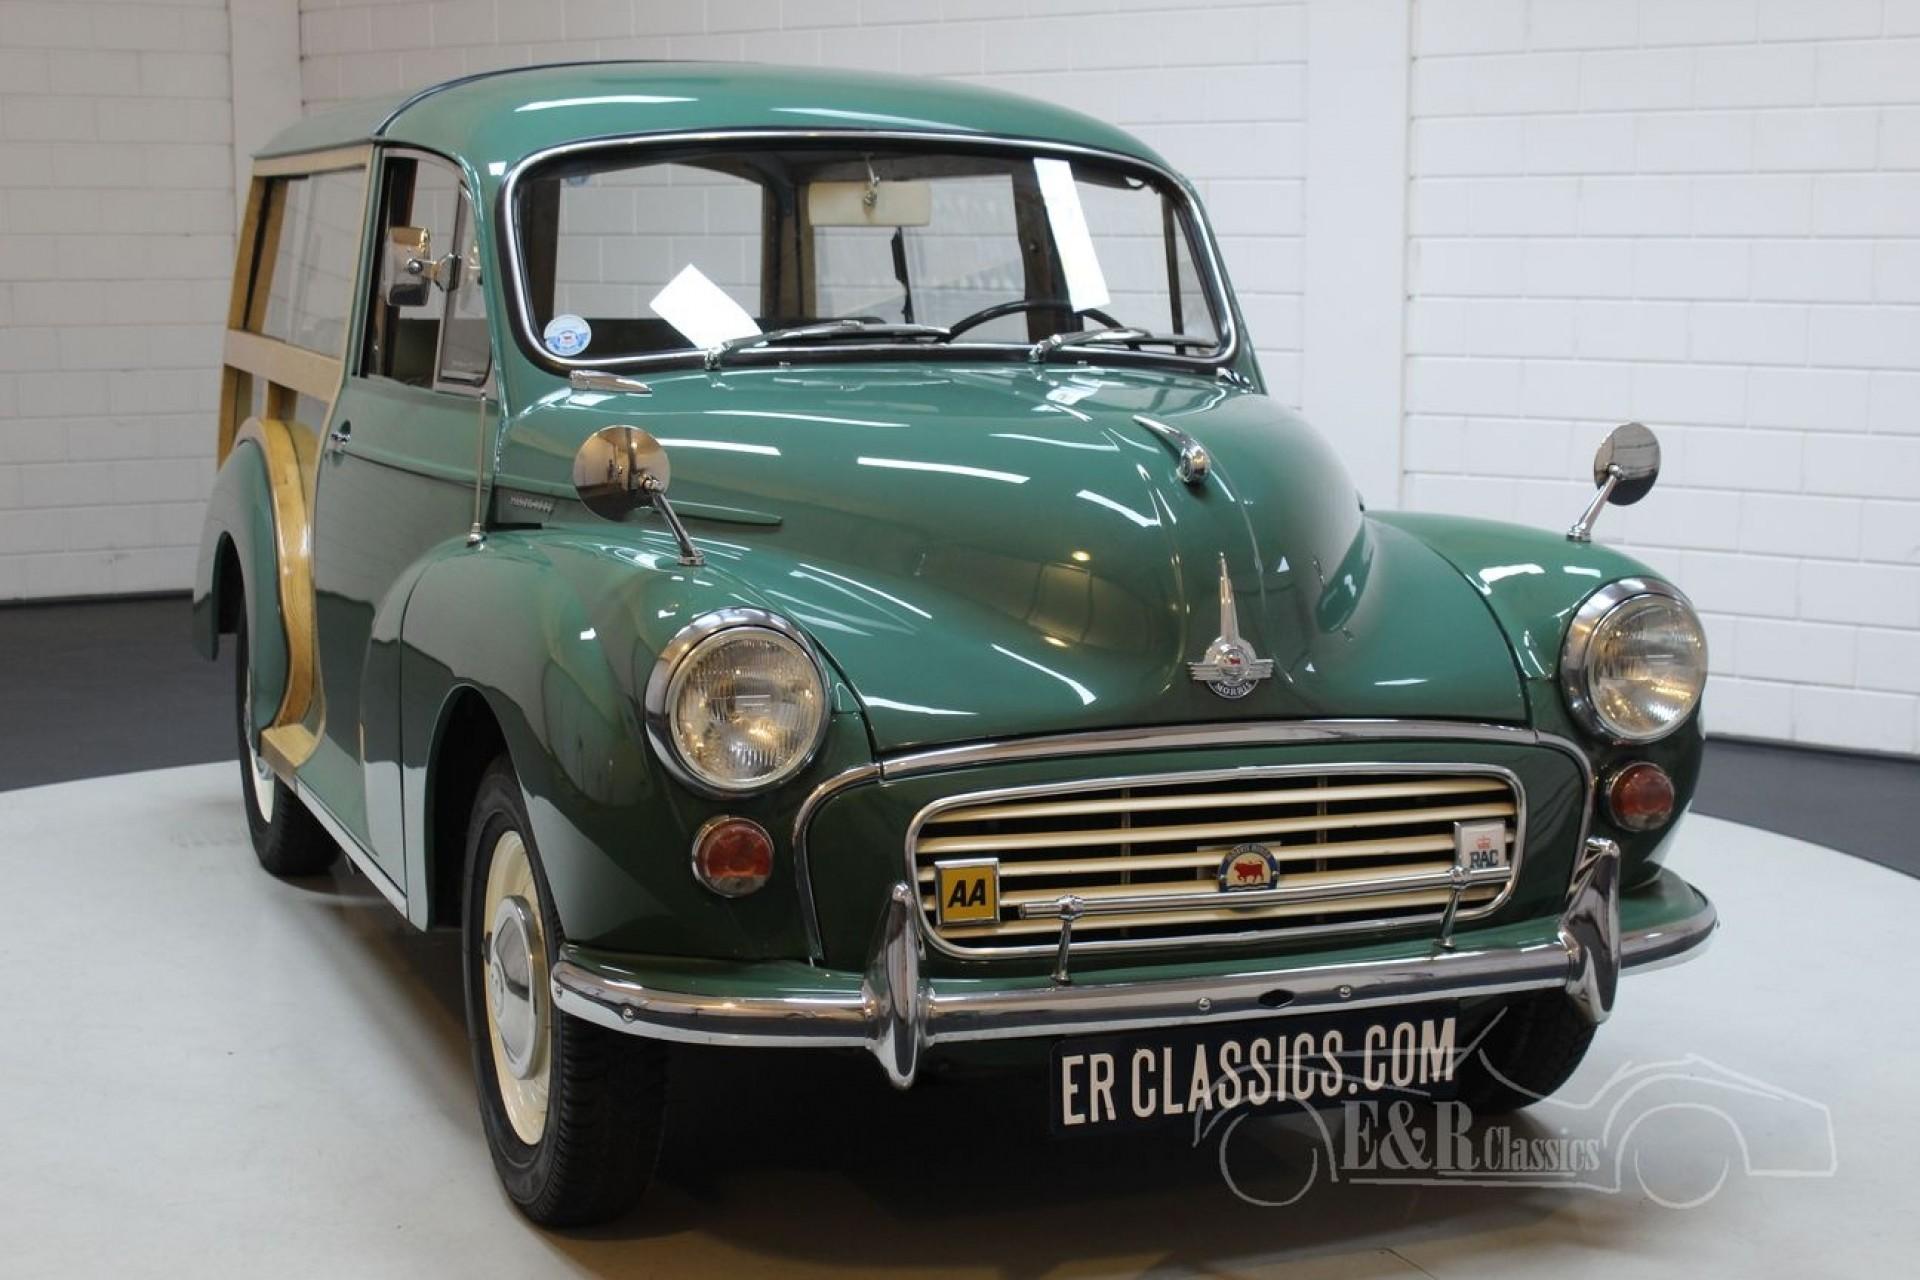 Morris Minor 1000 Traveller 1967 For Sale At Erclassics